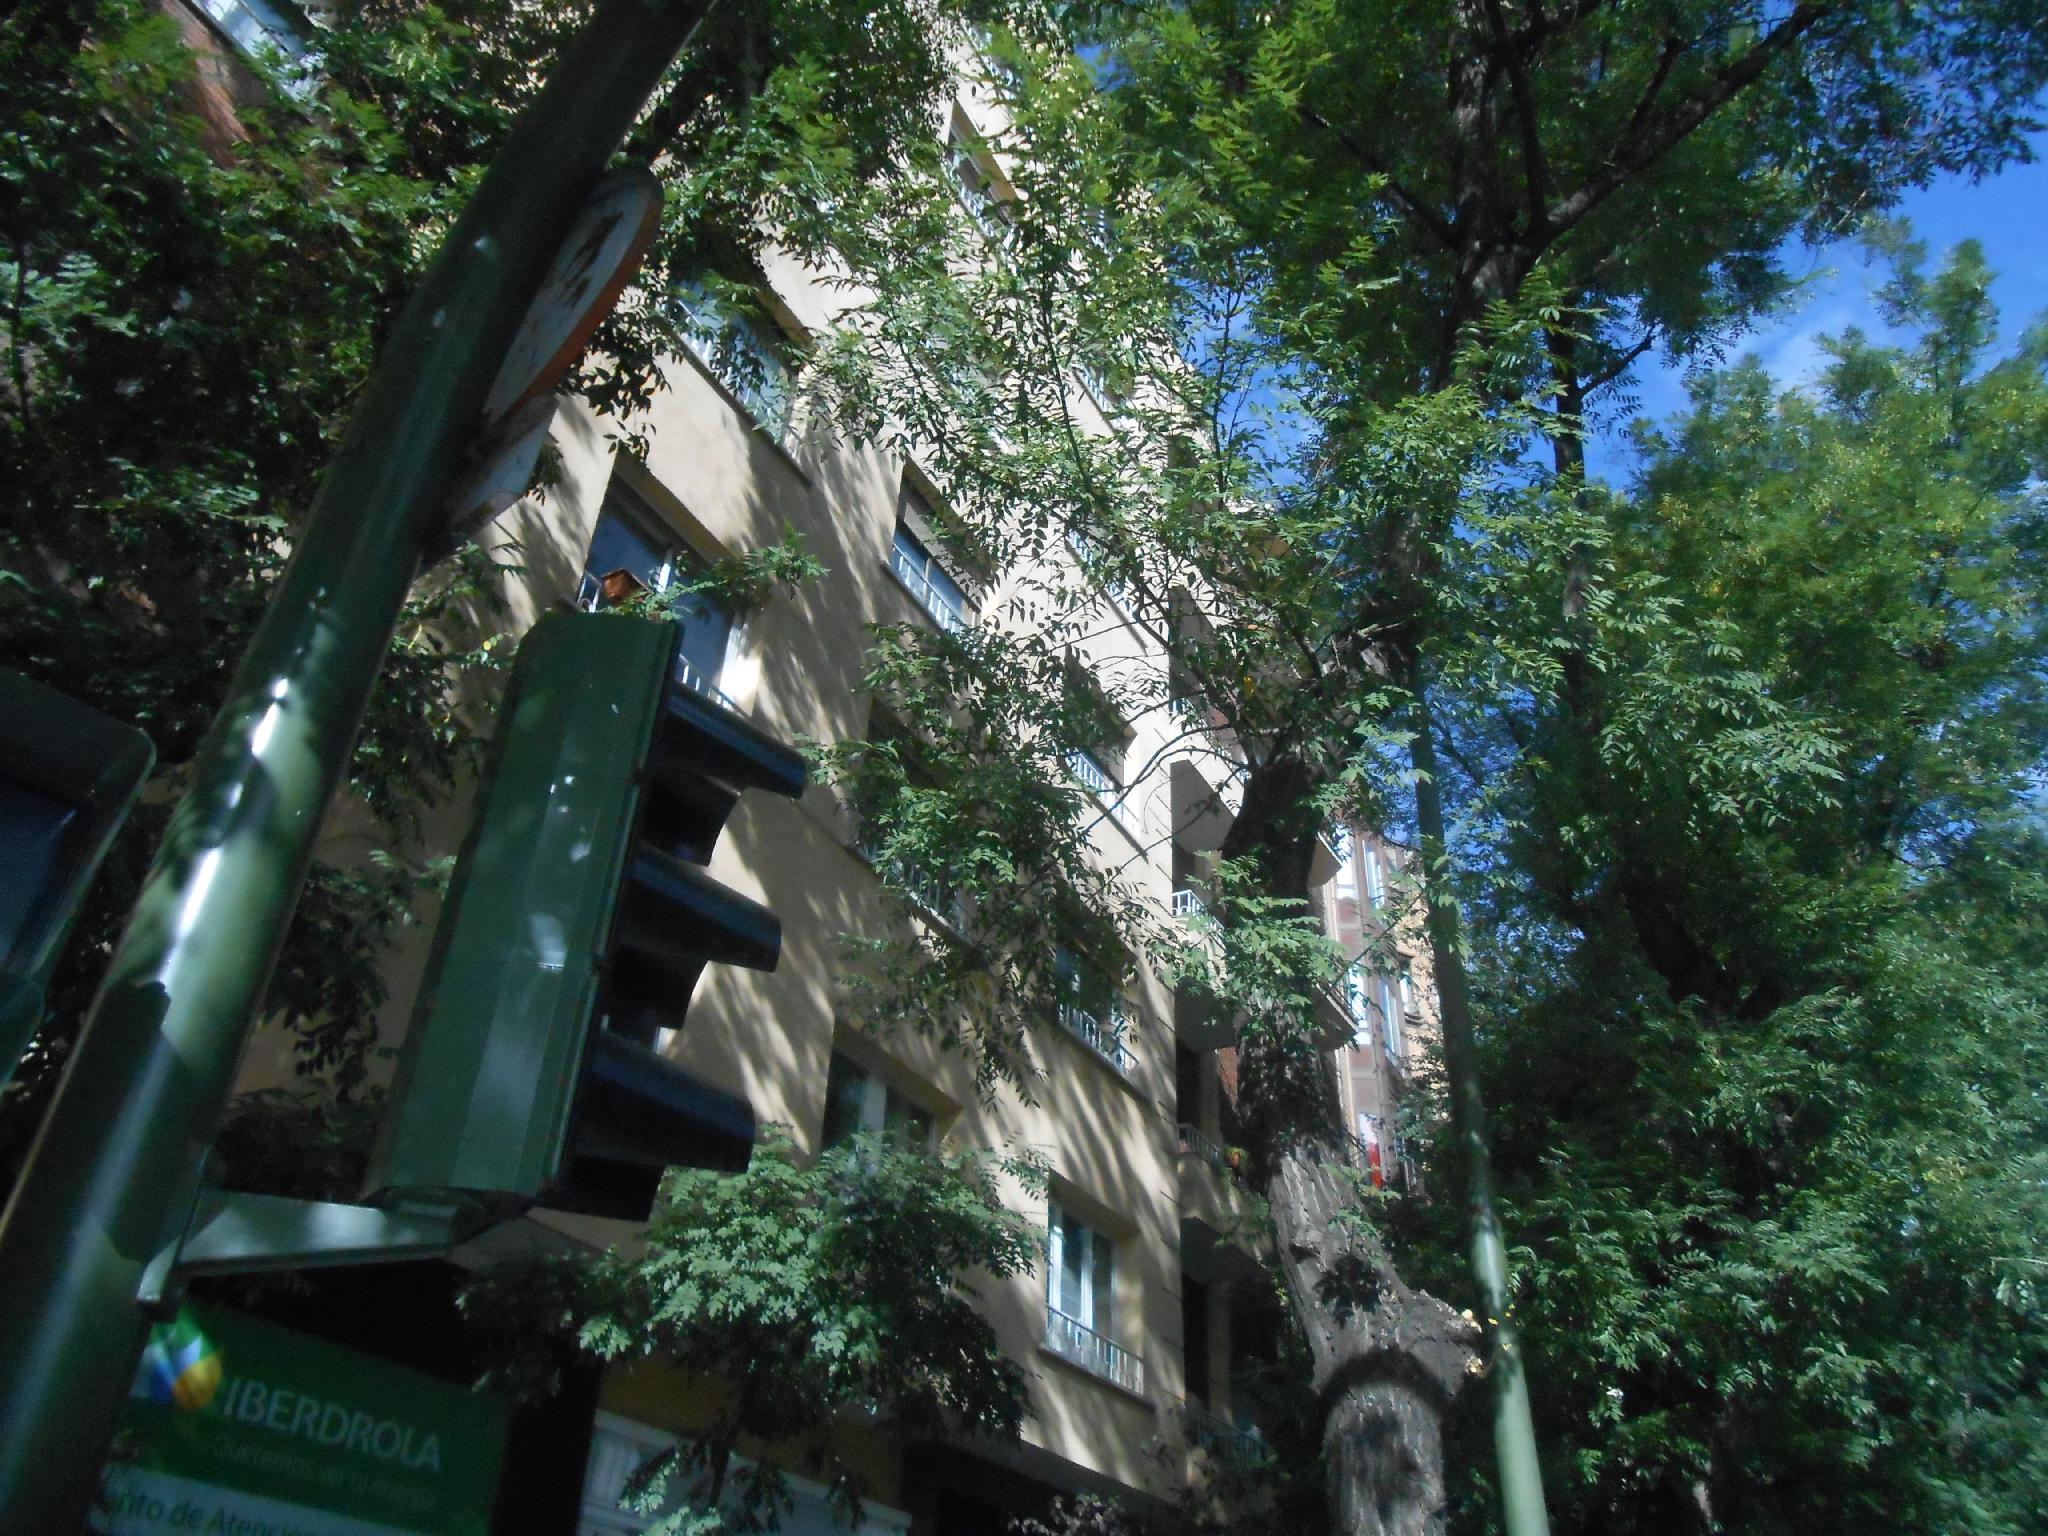 169823 - Eloy gonzalo excelente zona piso a reformar